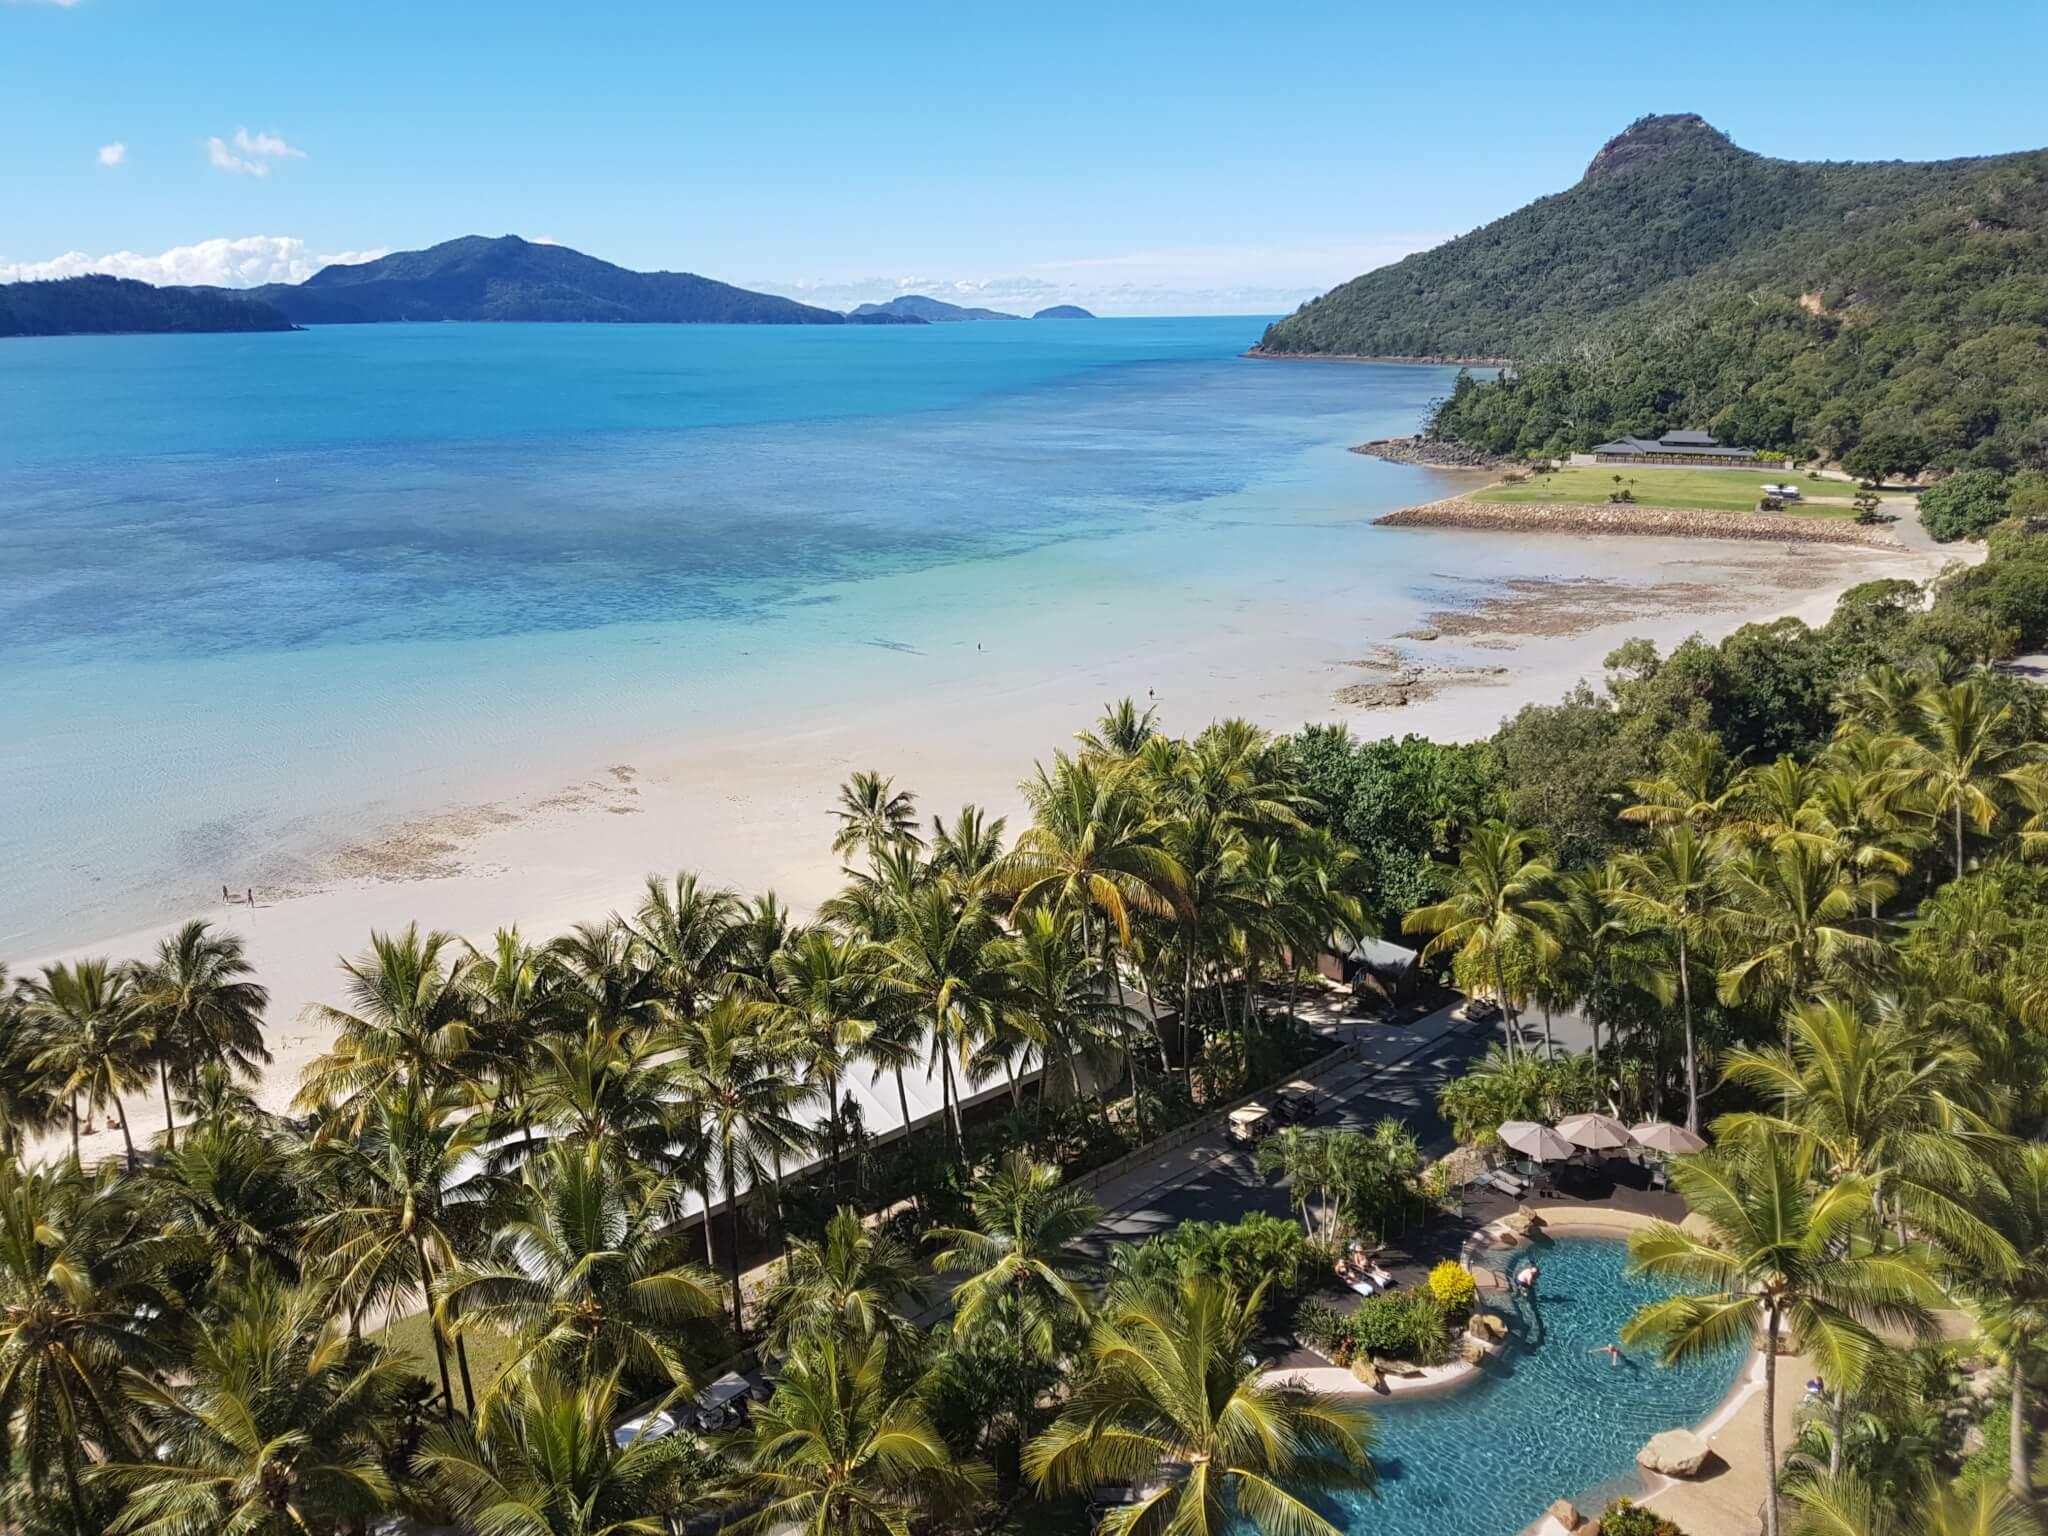 Top 10 Things to do on Hamilton Island